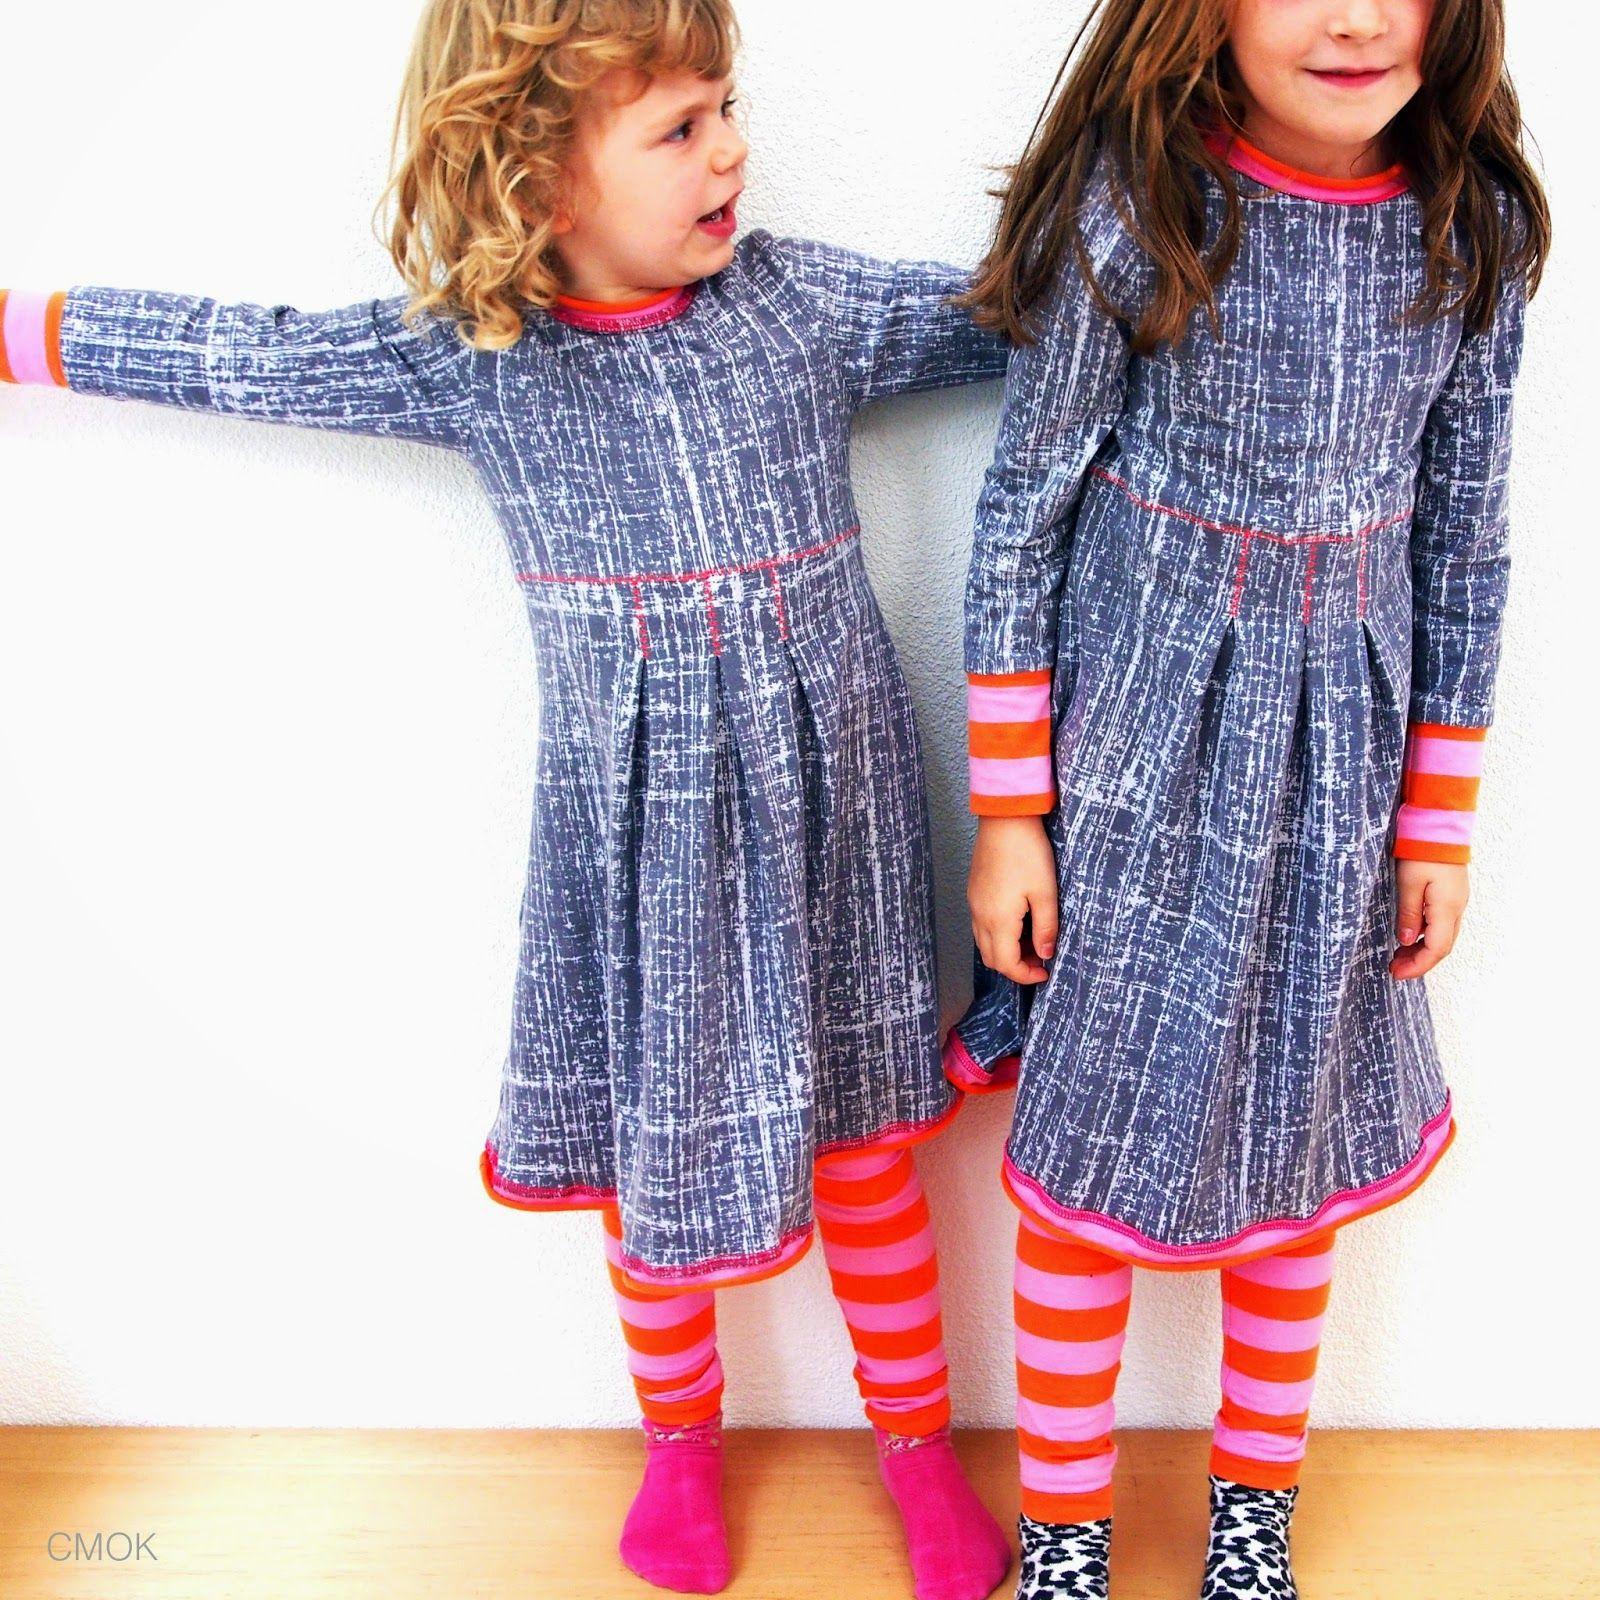 cmok: kleid ohne rollkragenlillesol & pelle nr. 39